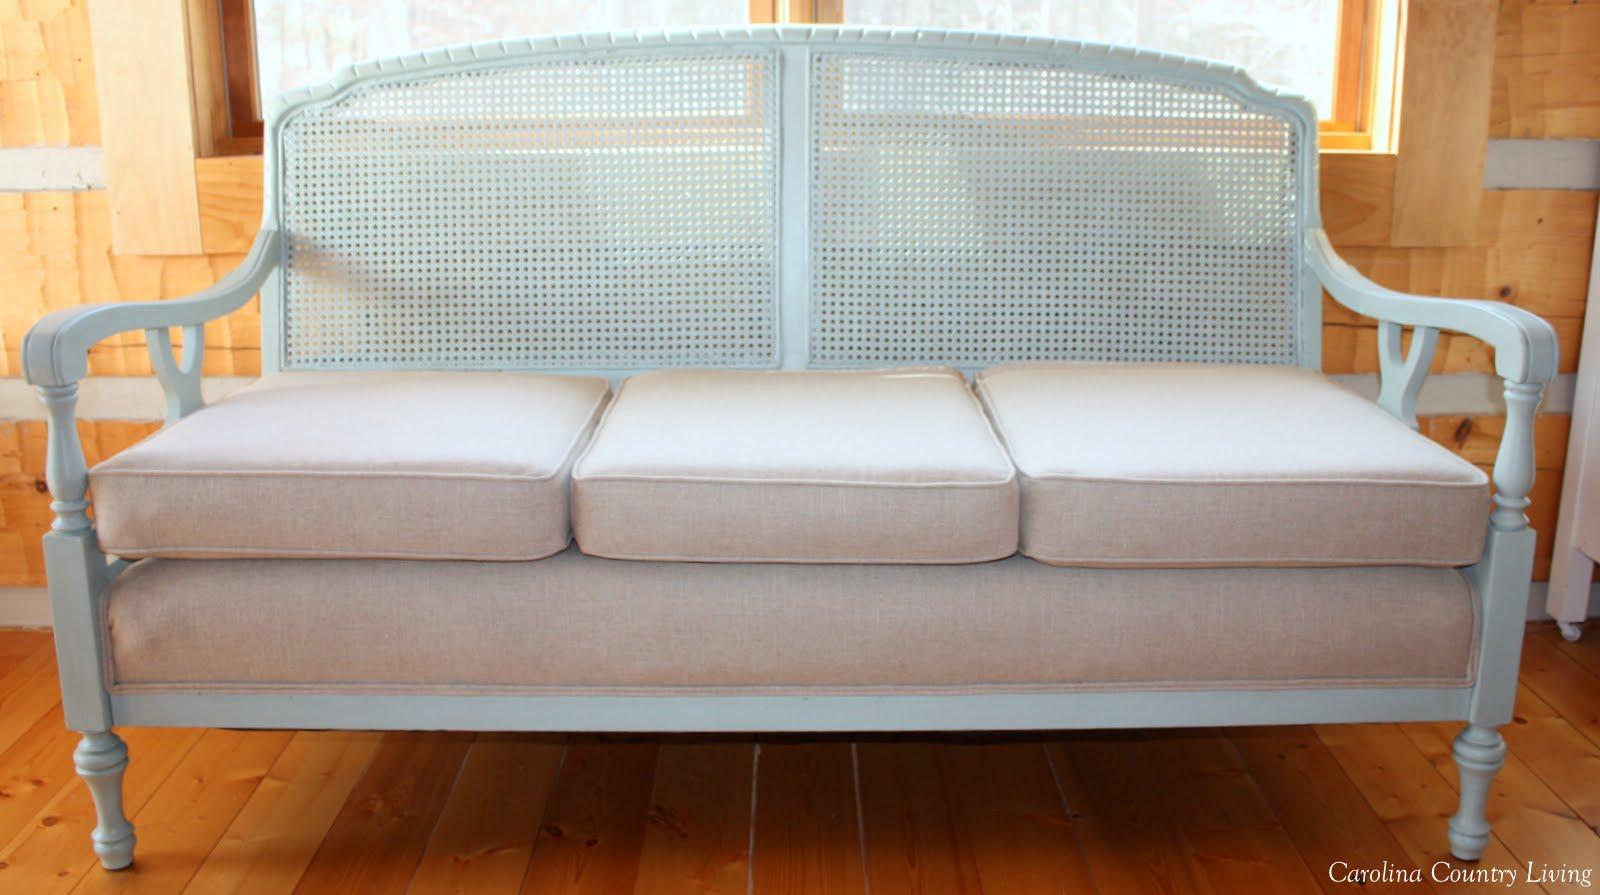 carolina country living cane back sofa before and after Cane Back Furniture Barrel Back Sofa